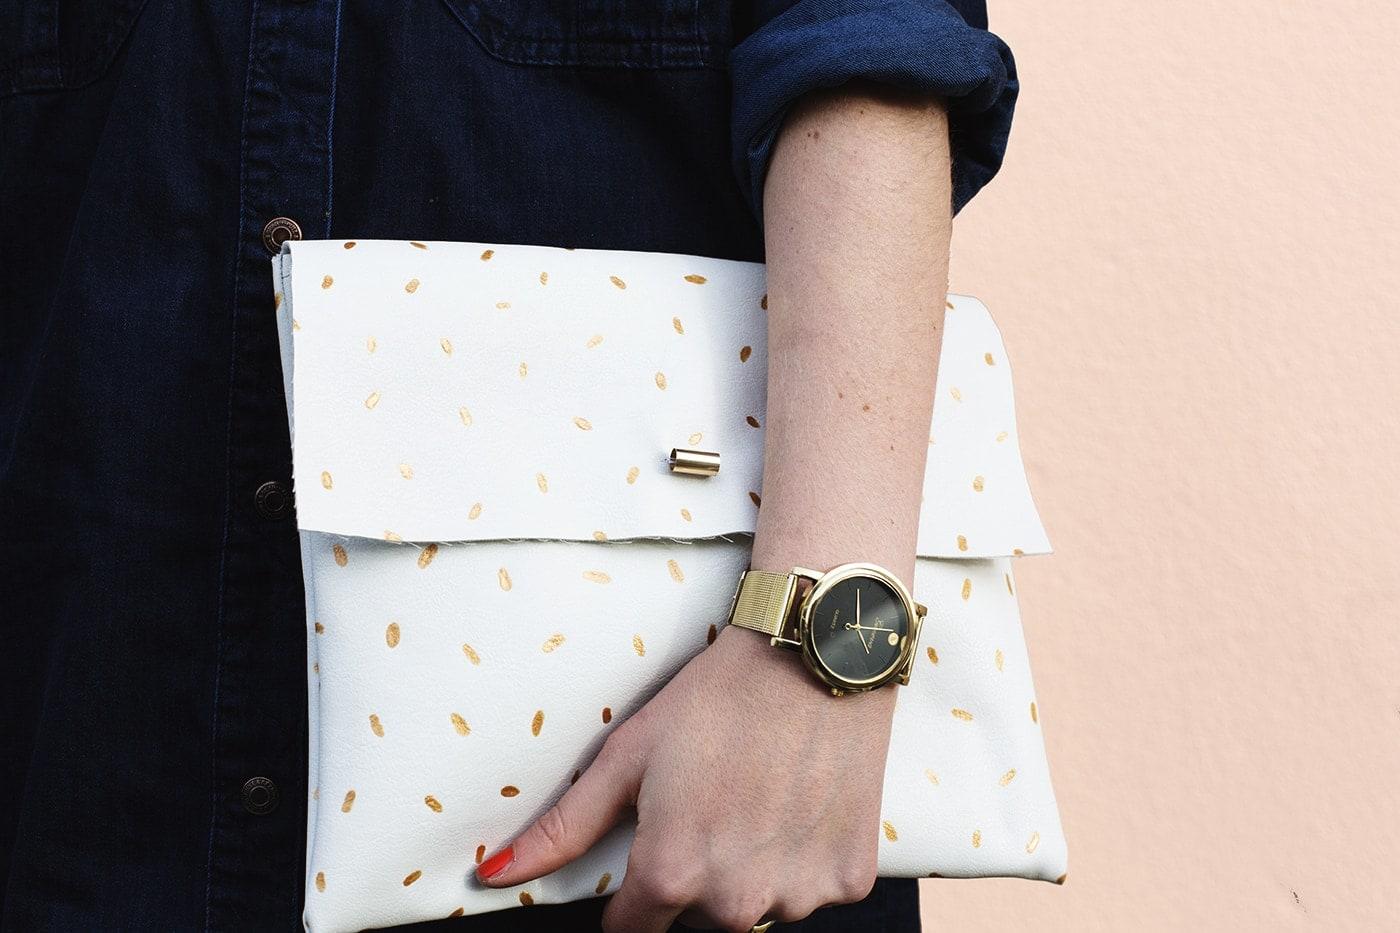 DIY metallic patter clutch bag | easy fashion crafts